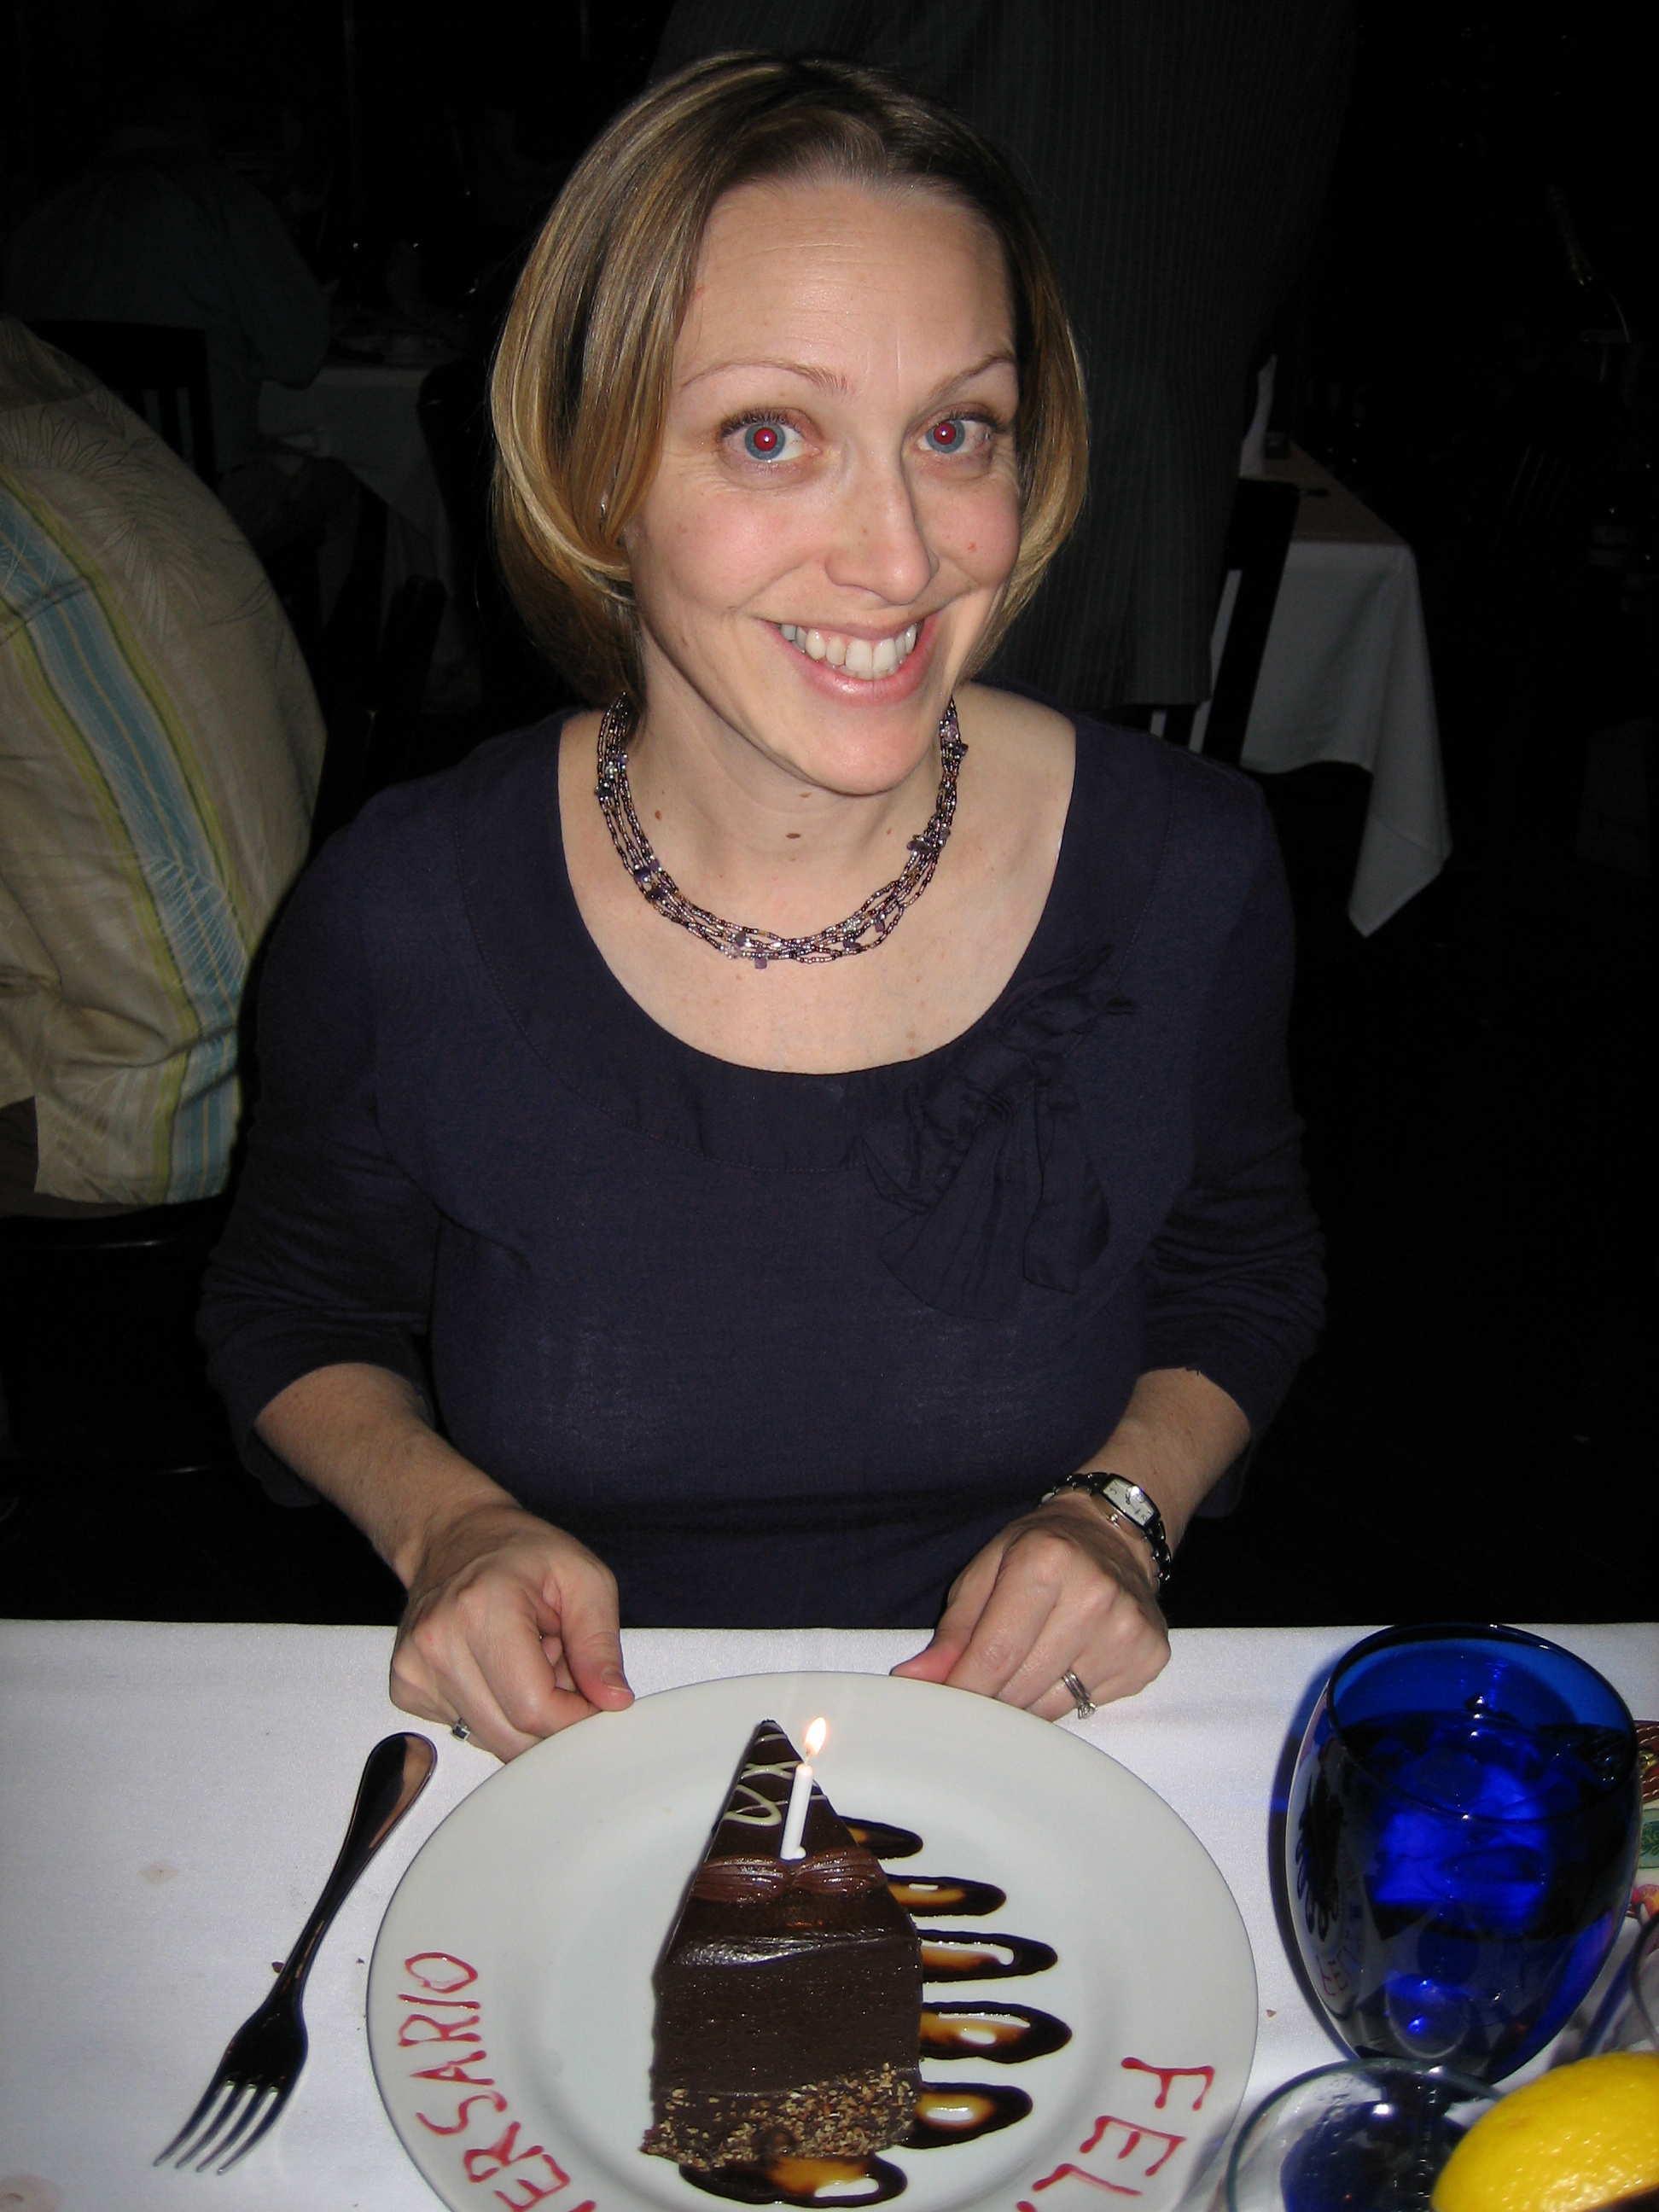 Suzie's Birthday Cake